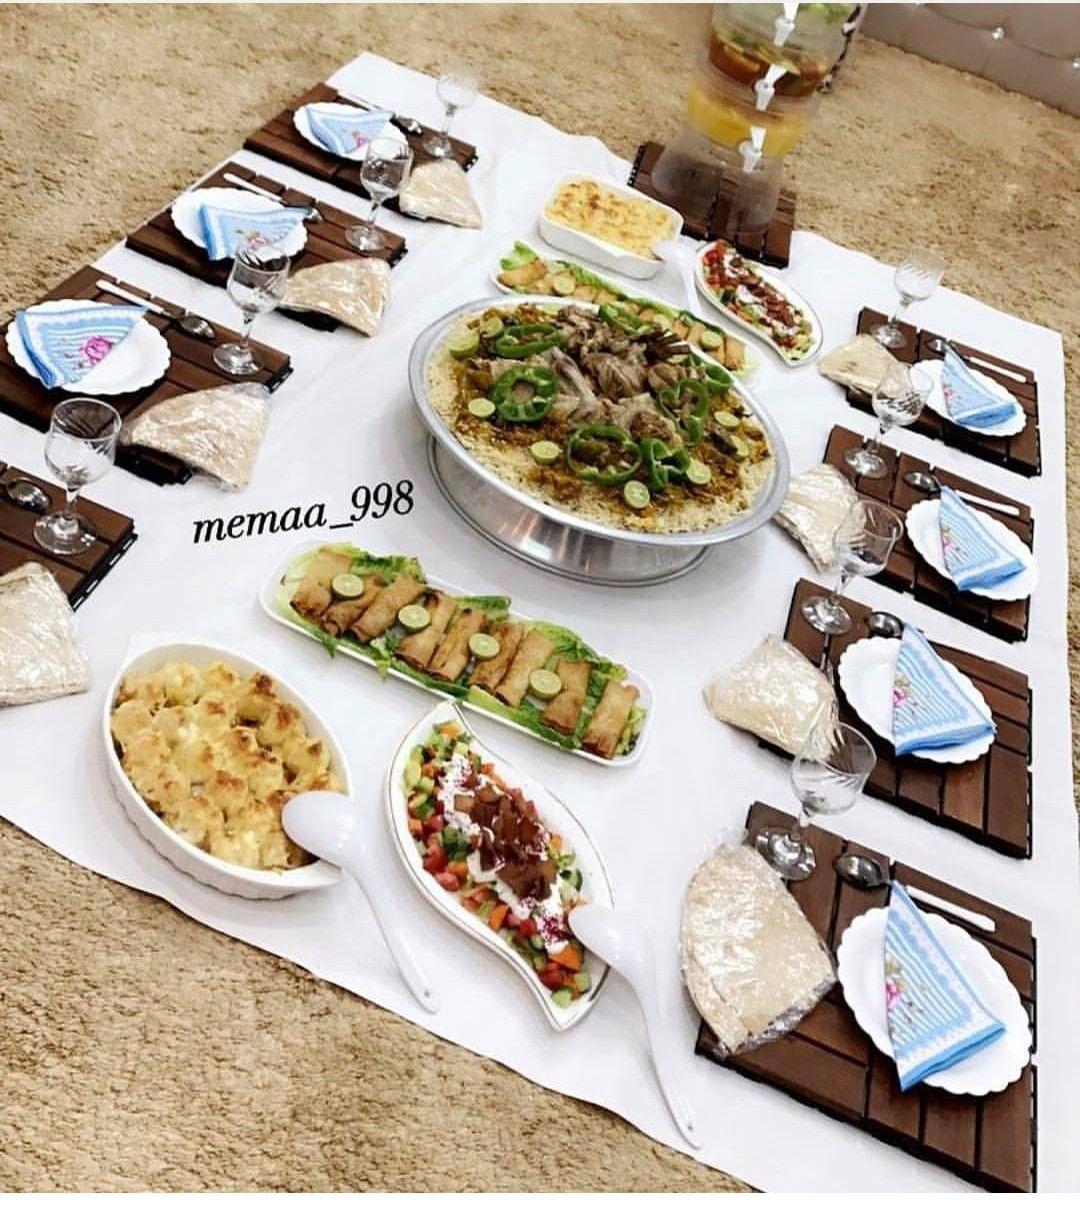 Pin By Hhjl On ضيافة Snap Food Food Presentation Diy Food Recipes